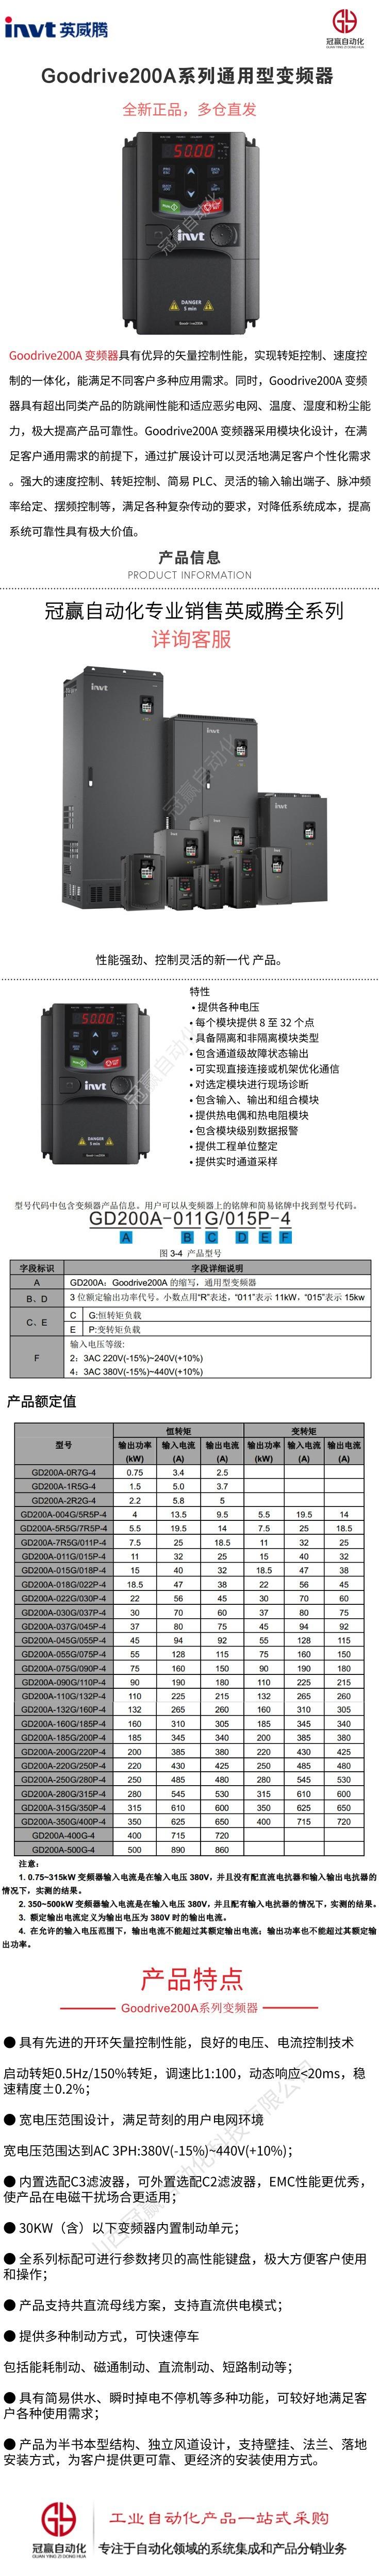 Goodrive200A系列通用型开环矢量变频器